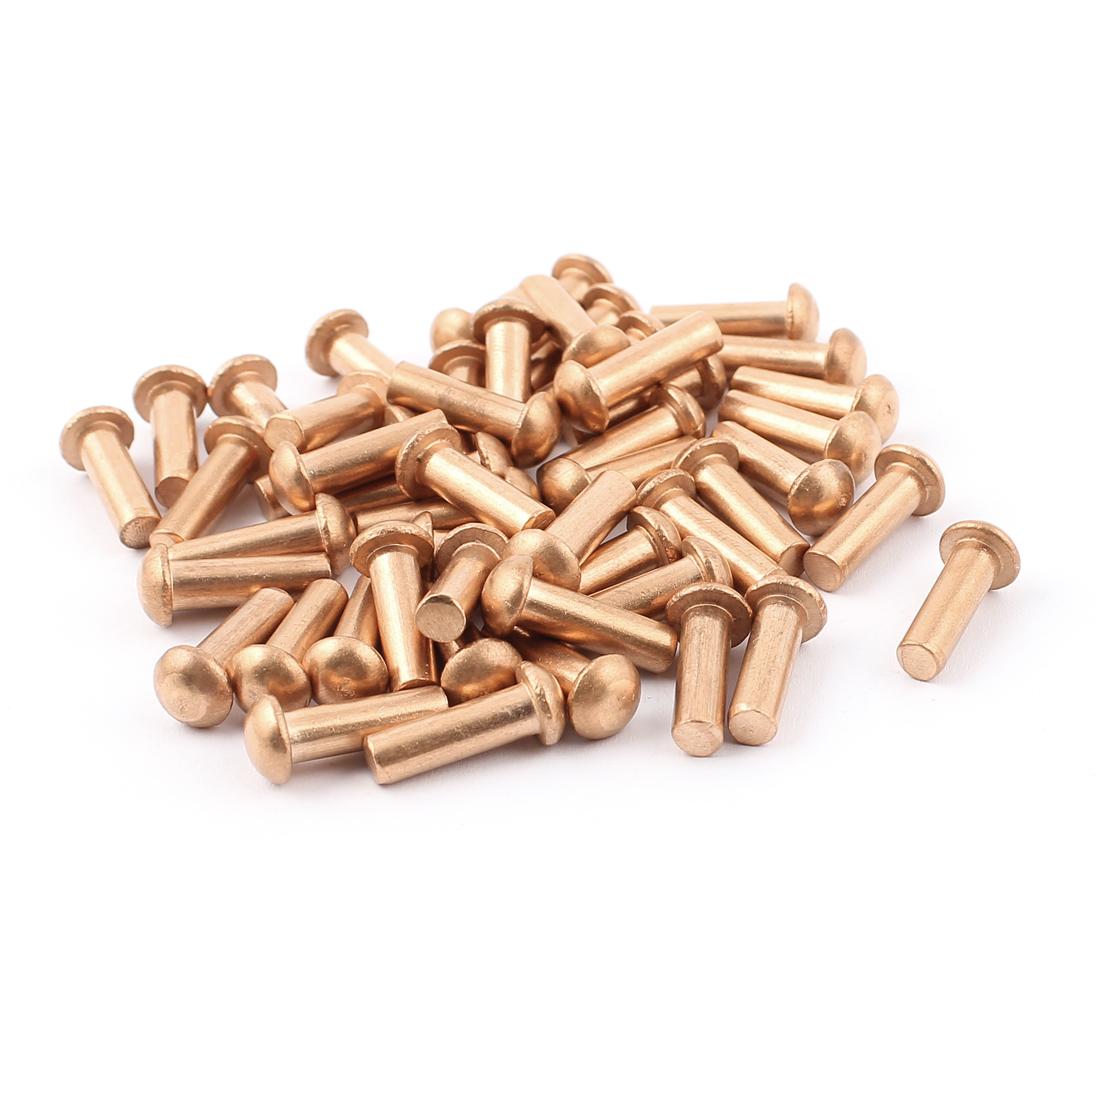 "50 Pcs 3/16"" Diameter 5/8"" L Shank Round Head Copper Solid Rivets Fasteners"